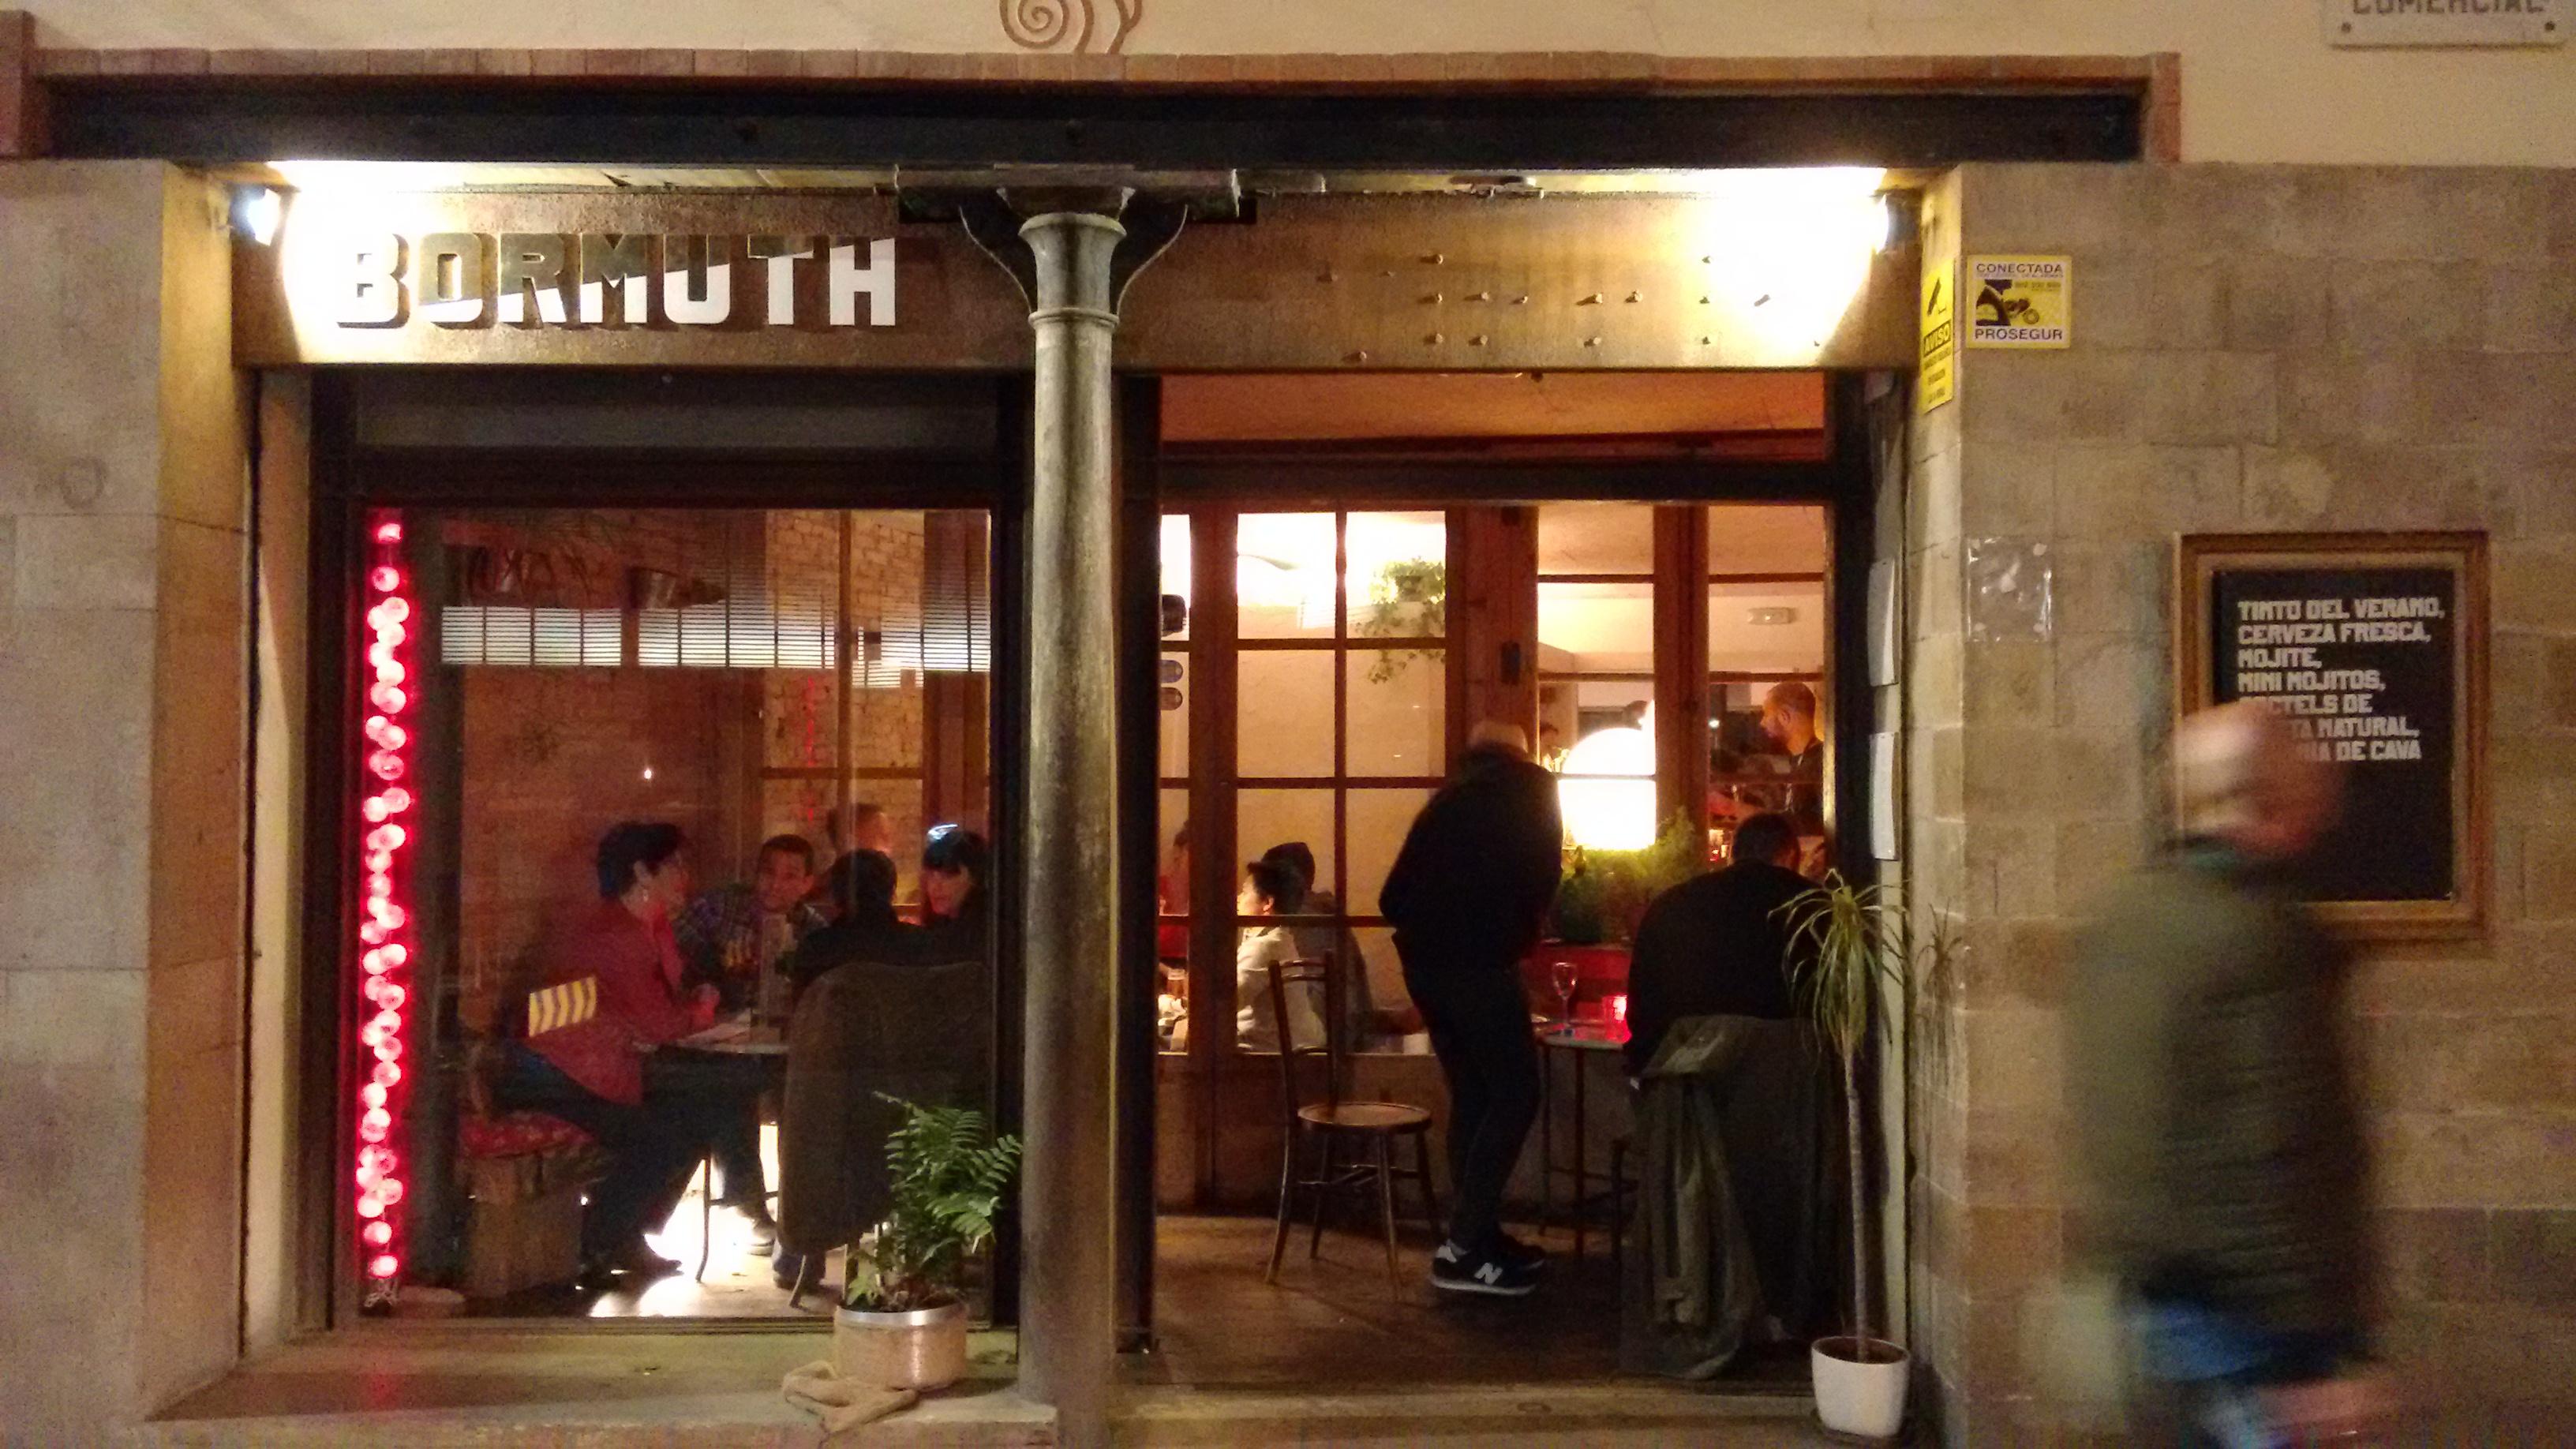 Vermut en Barcelona: Bormuth